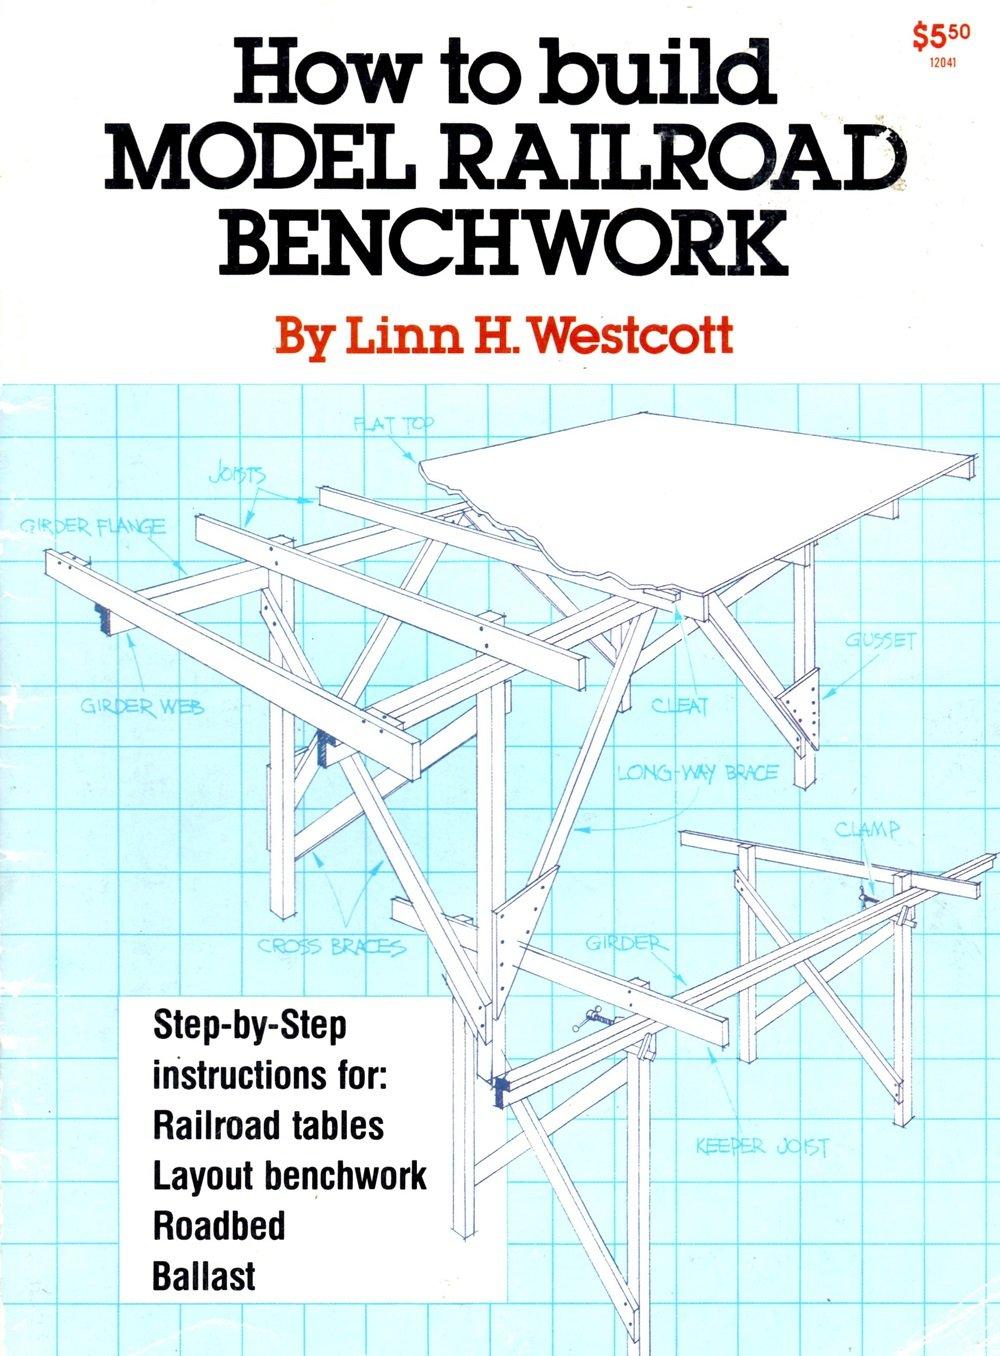 How to Build Model Railroad Benchwork, Linn Hanson Westcott